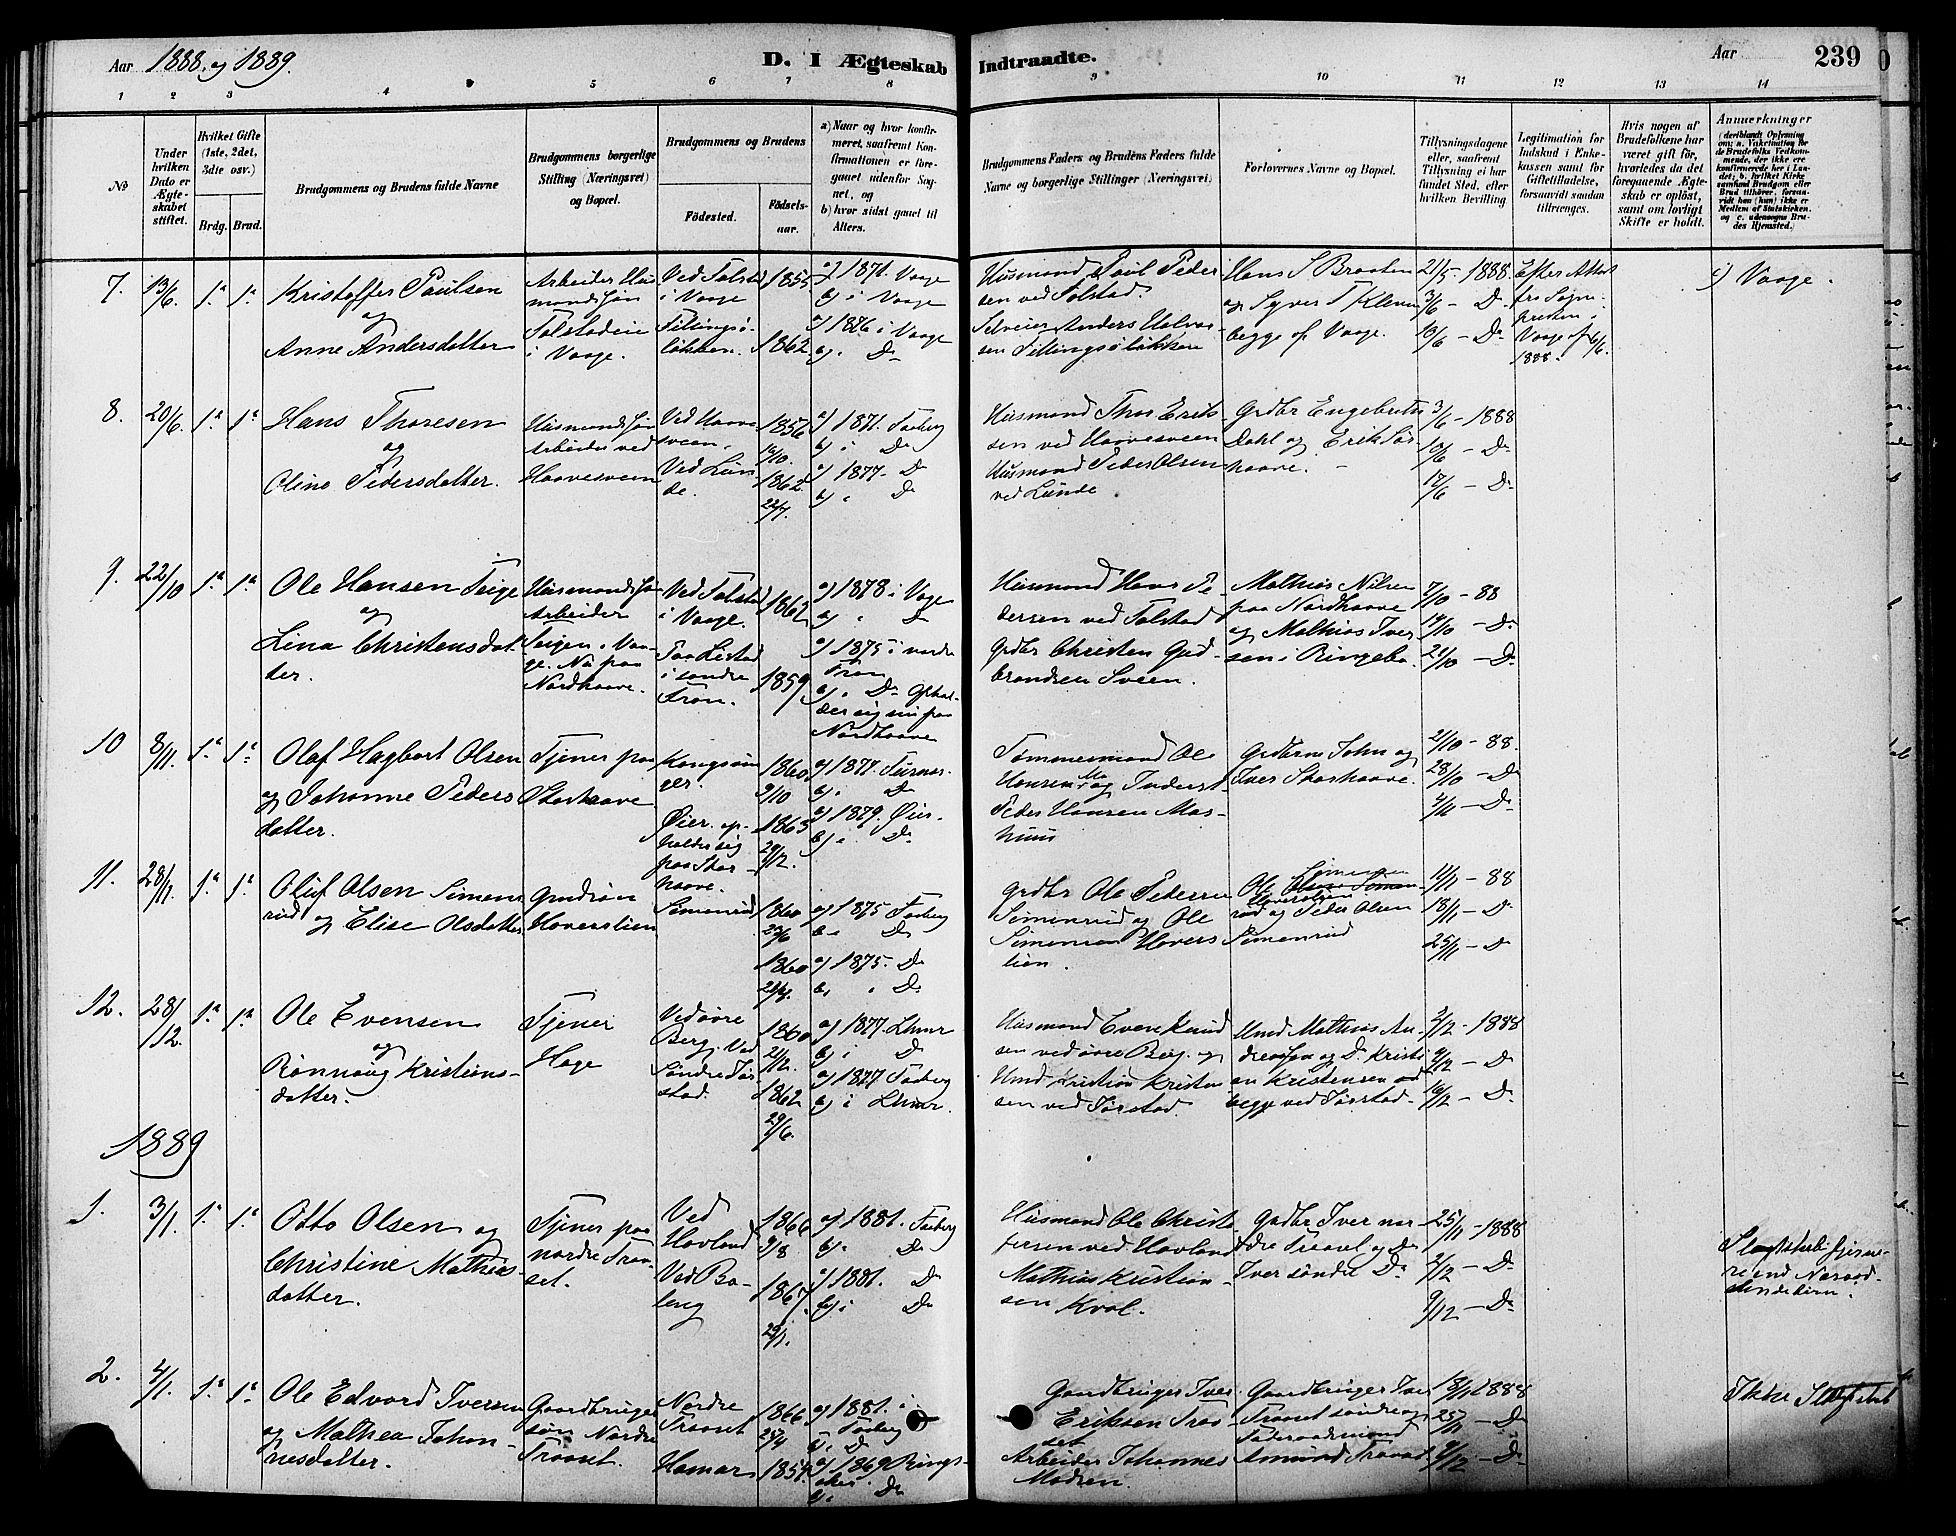 SAH, Fåberg prestekontor, Ministerialbok nr. 8, 1879-1898, s. 239